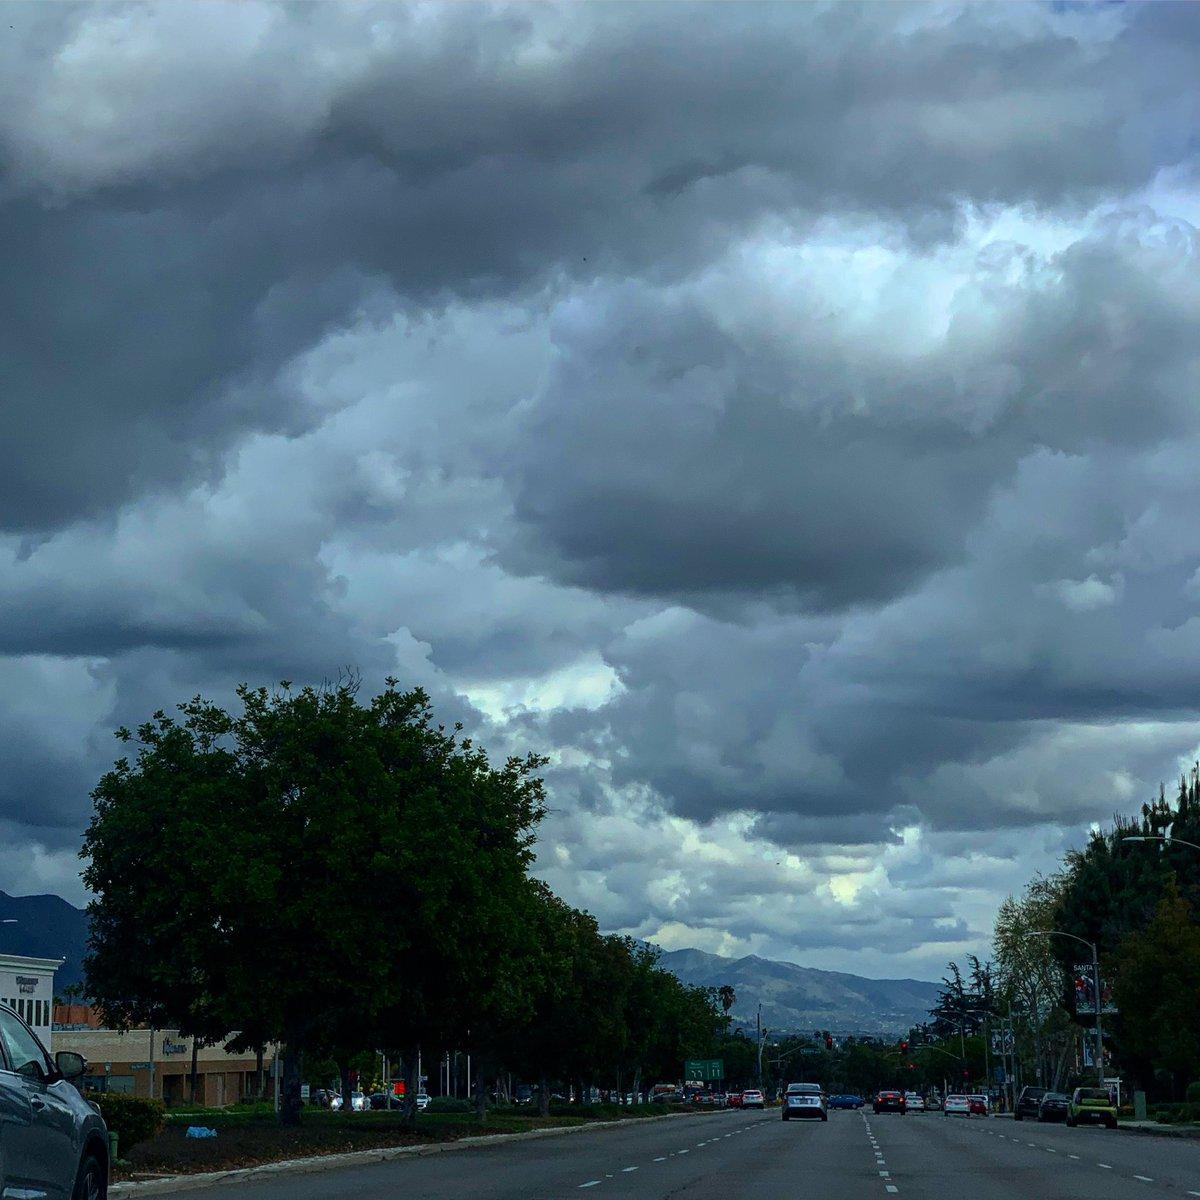 "#clouds #street #california #socal #photography #dailyphoto #art #artwork #artaday #artchallenge ""cloud diaries day 1938"""